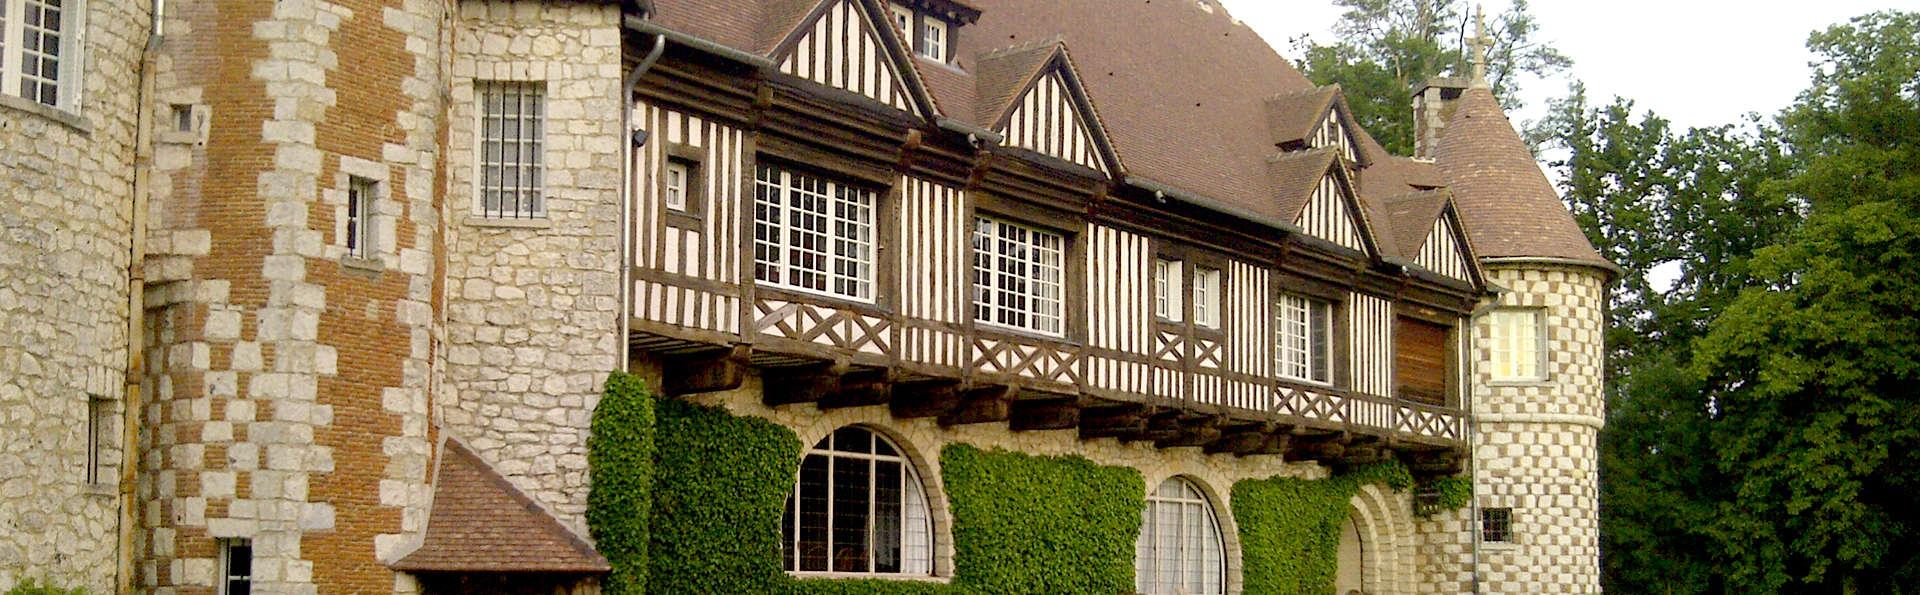 Manoir de Beaumarchais - Edit_Front5.jpg